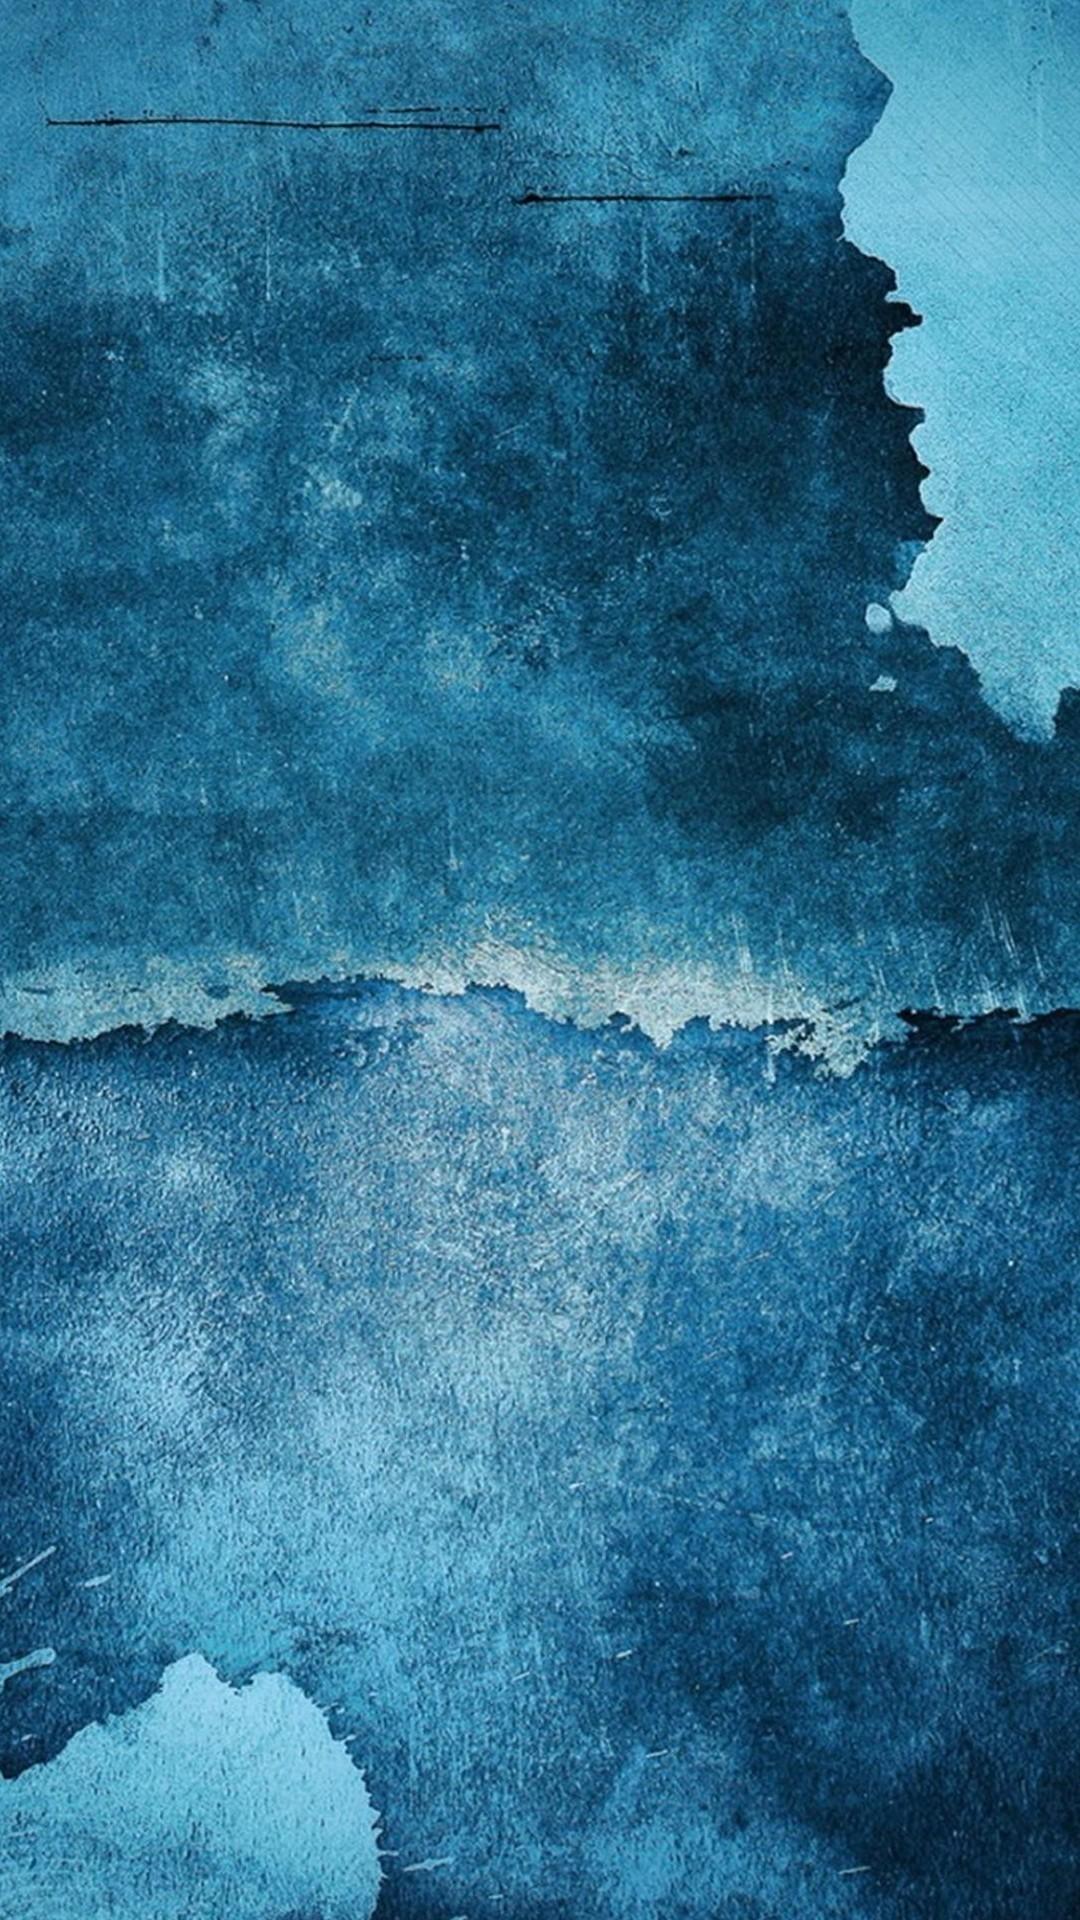 Grunge screensaver wallpaper